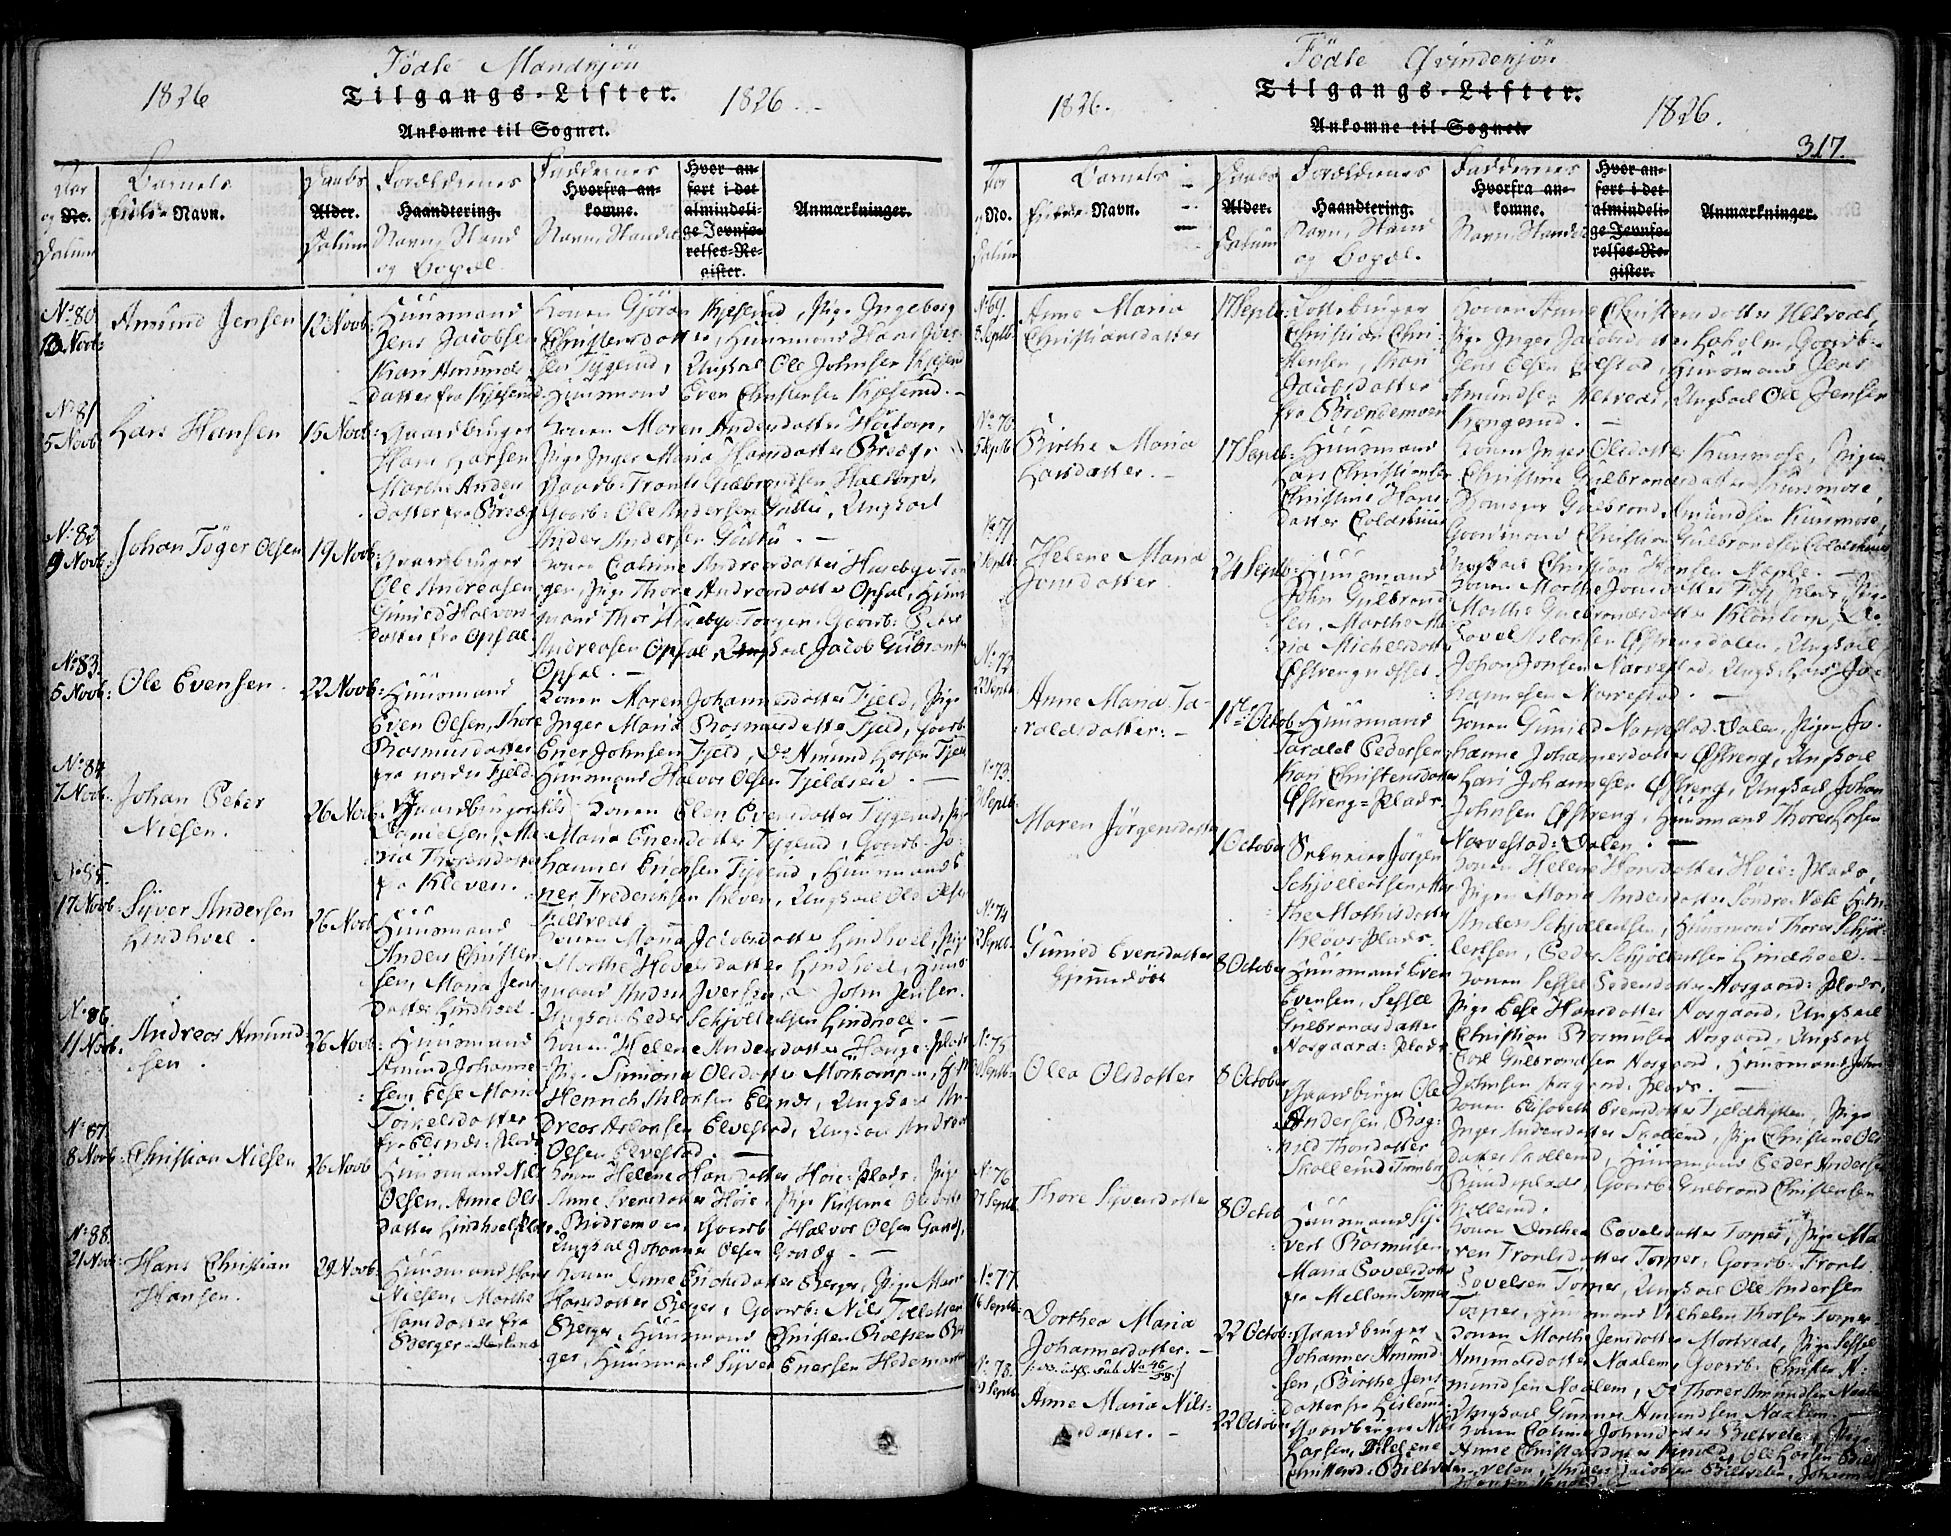 SAO, Eidsberg prestekontor Kirkebøker, F/Fa/L0007: Ministerialbok nr. I 7, 1814-1832, s. 317